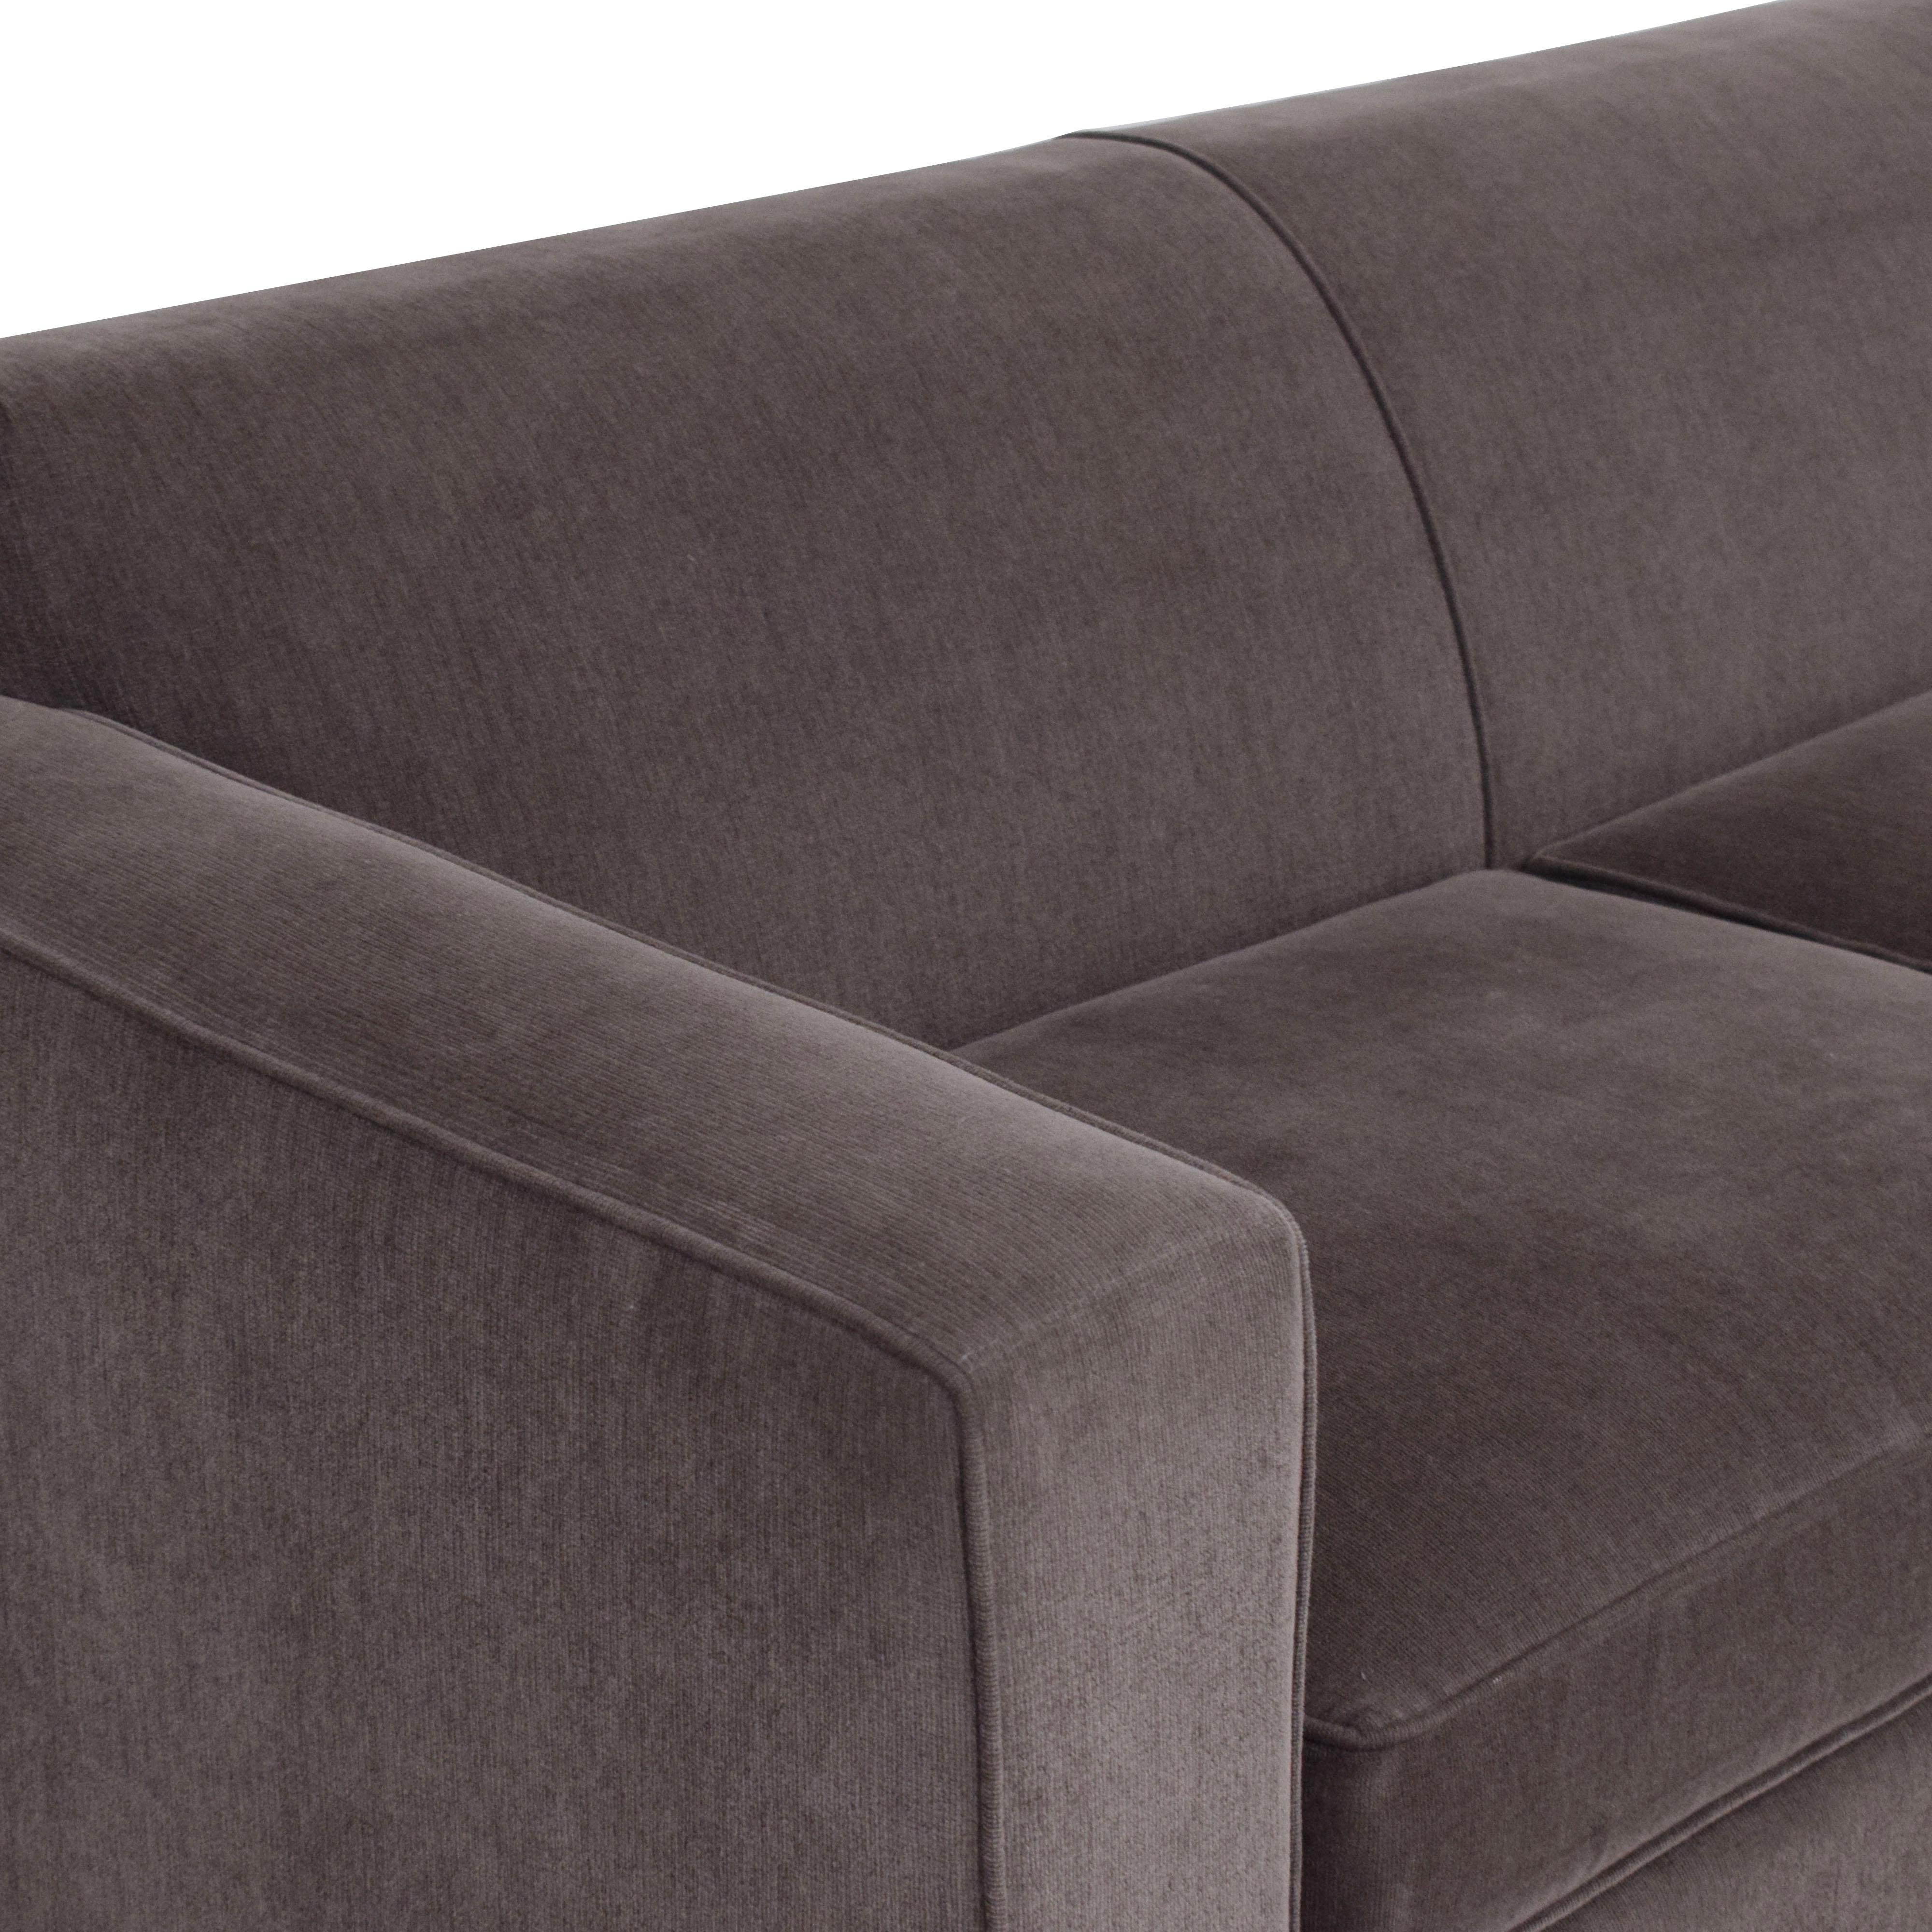 Room & Board Room & Board Ian Two Piece Sectional Sofa on sale